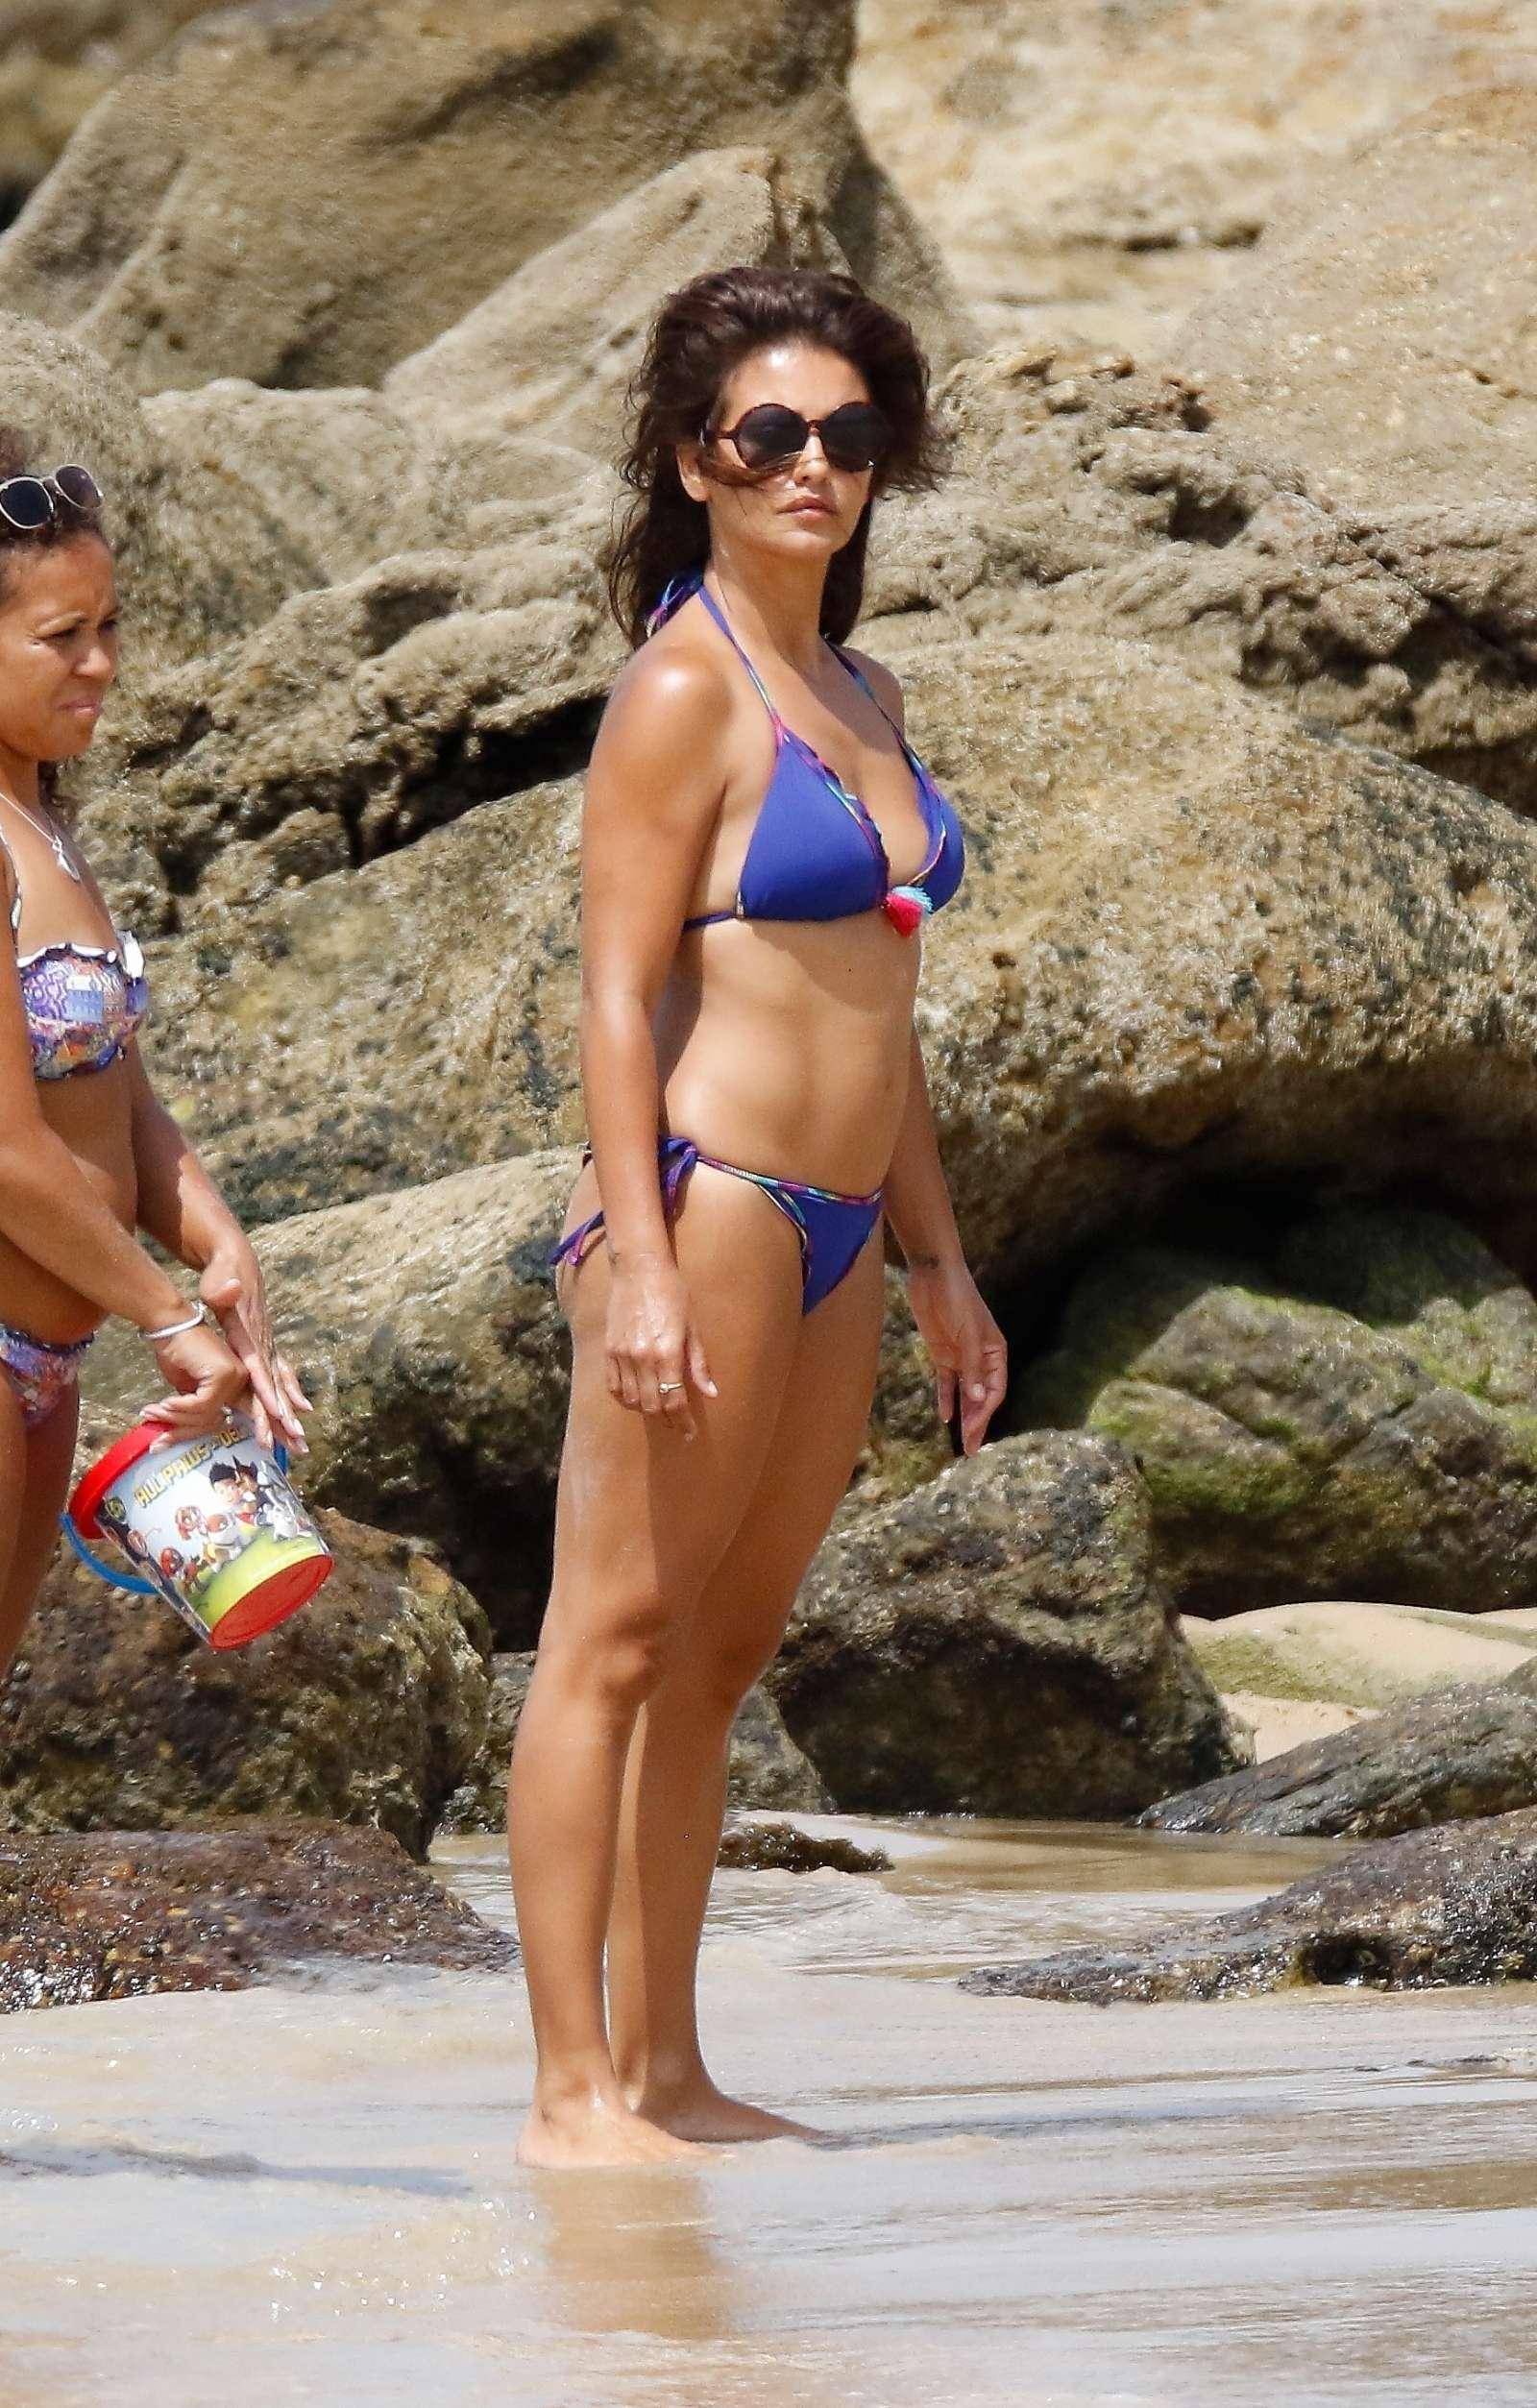 Monica Cruz 2017 : Monica Cruz in Bikini 2017 -32